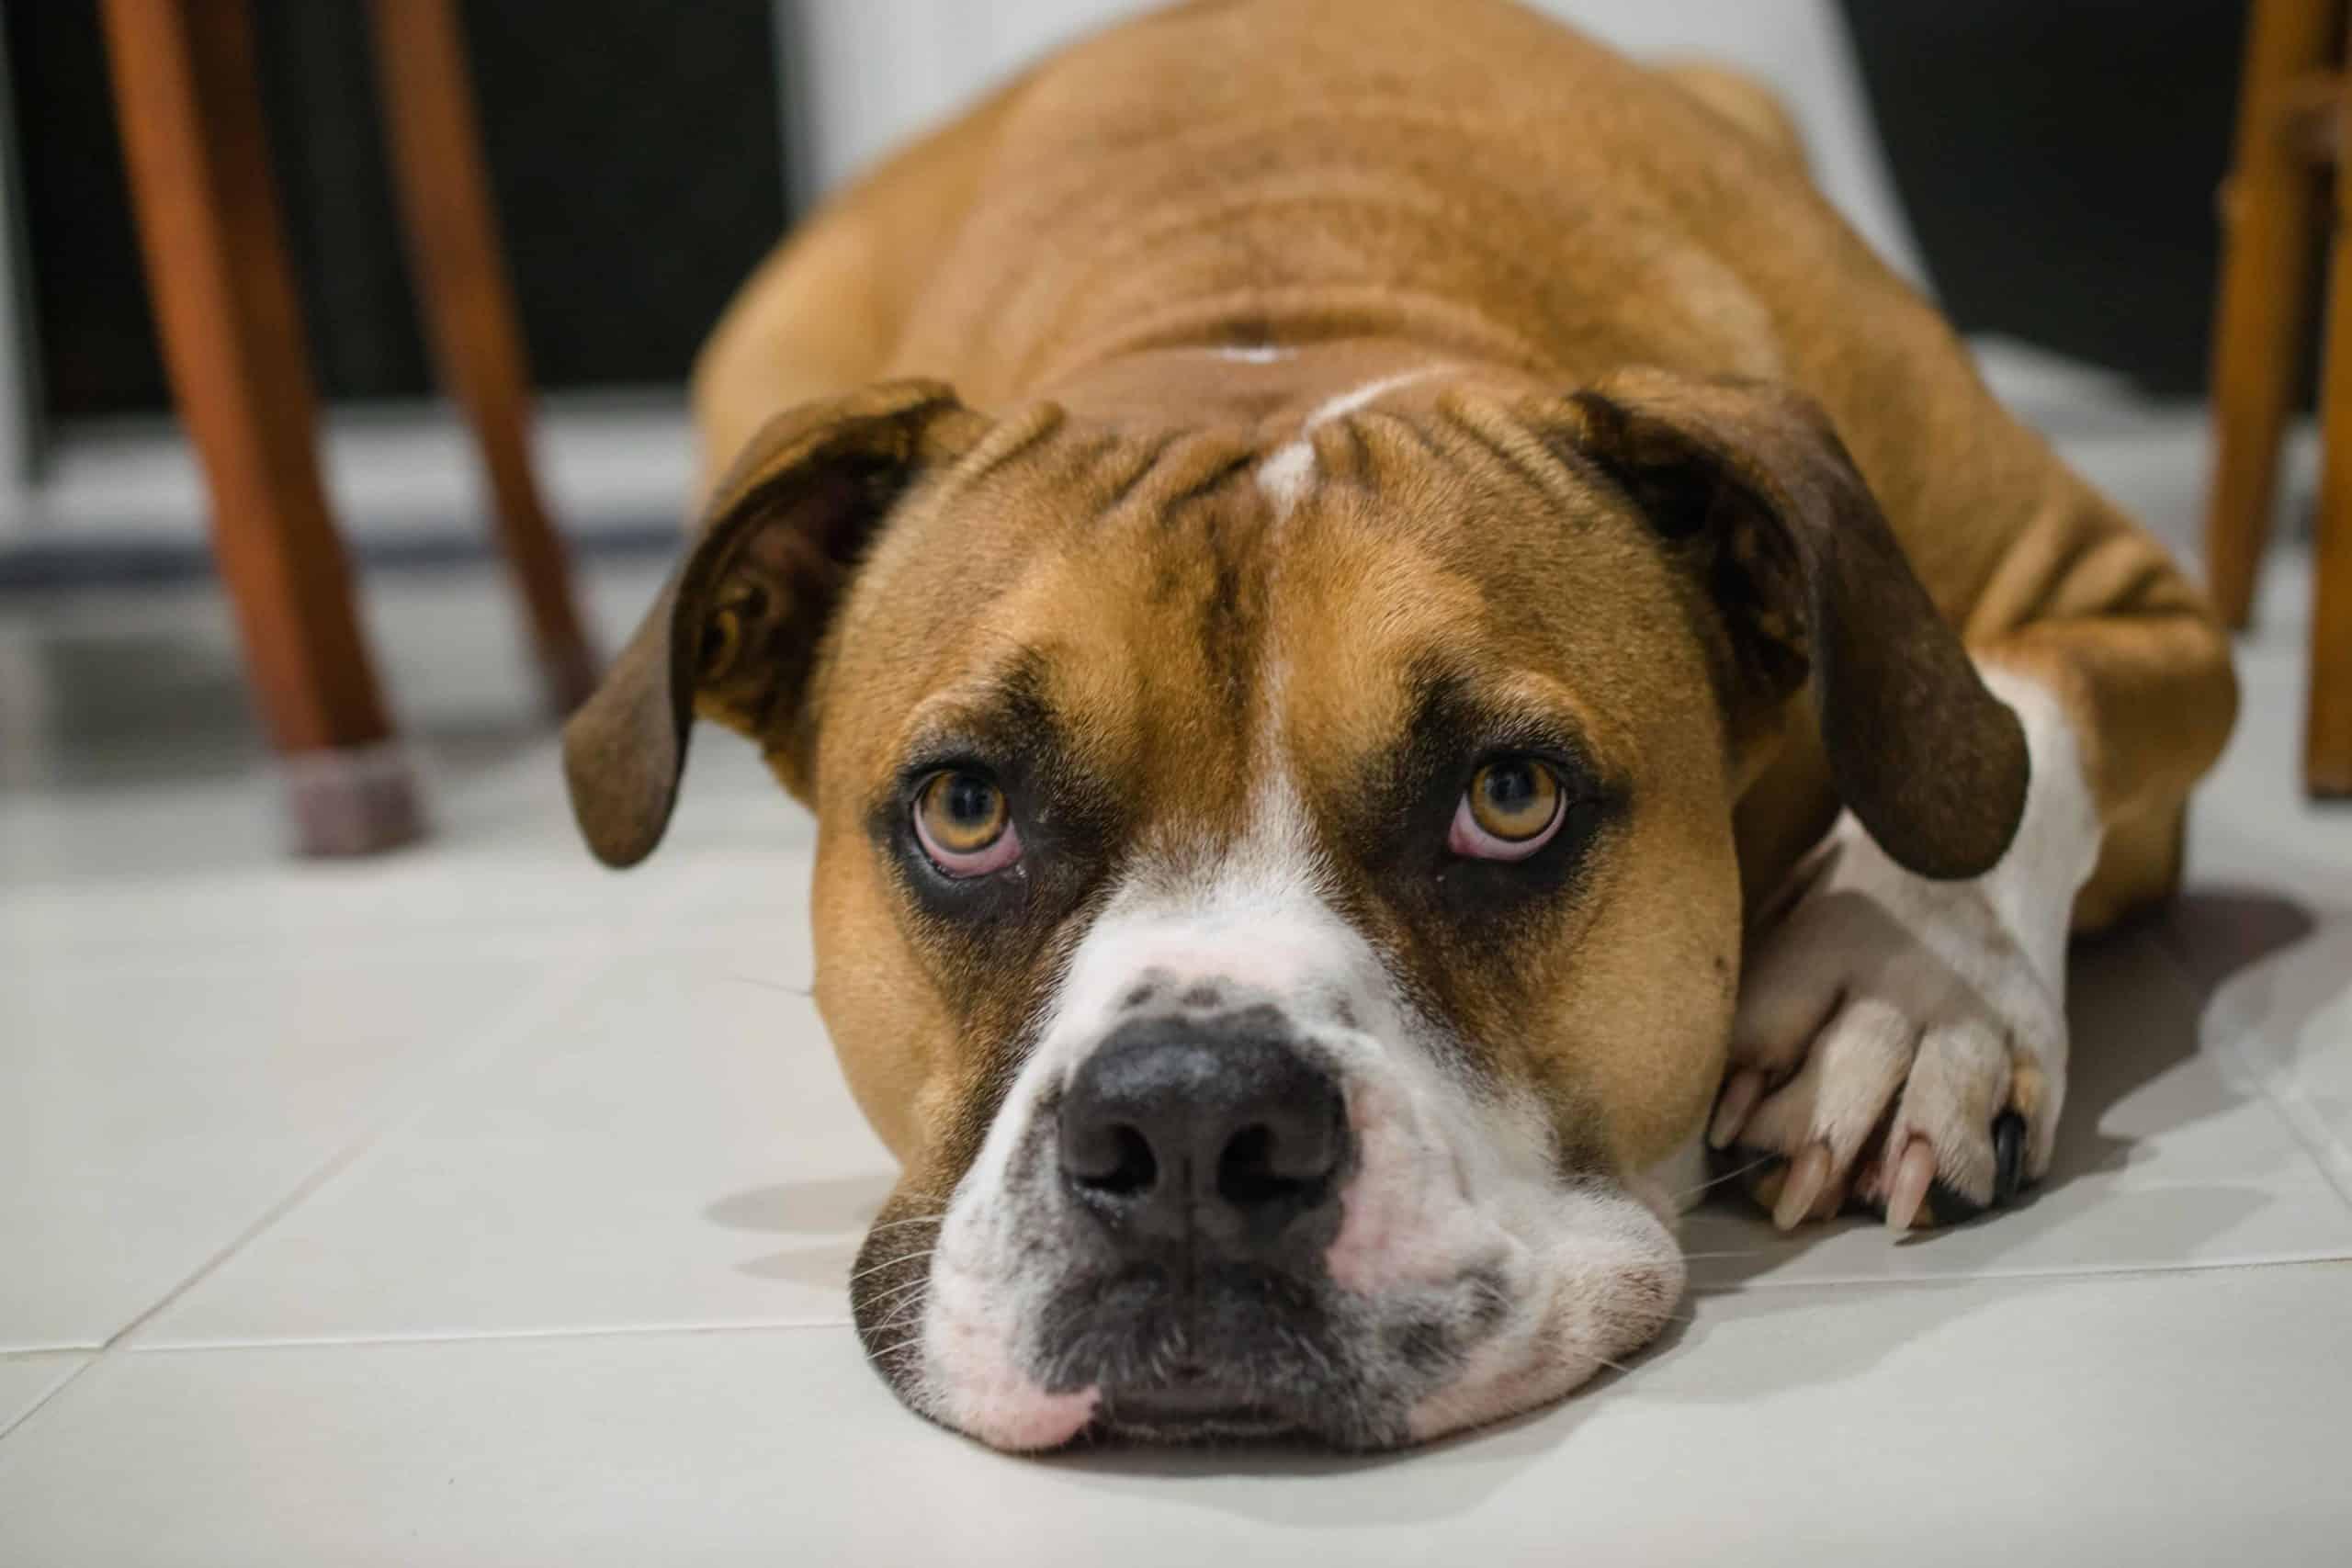 Australian Bulldog lies on the floor. The Australian bulldog is loyal and playful. It is one of eight bulldog breeds.